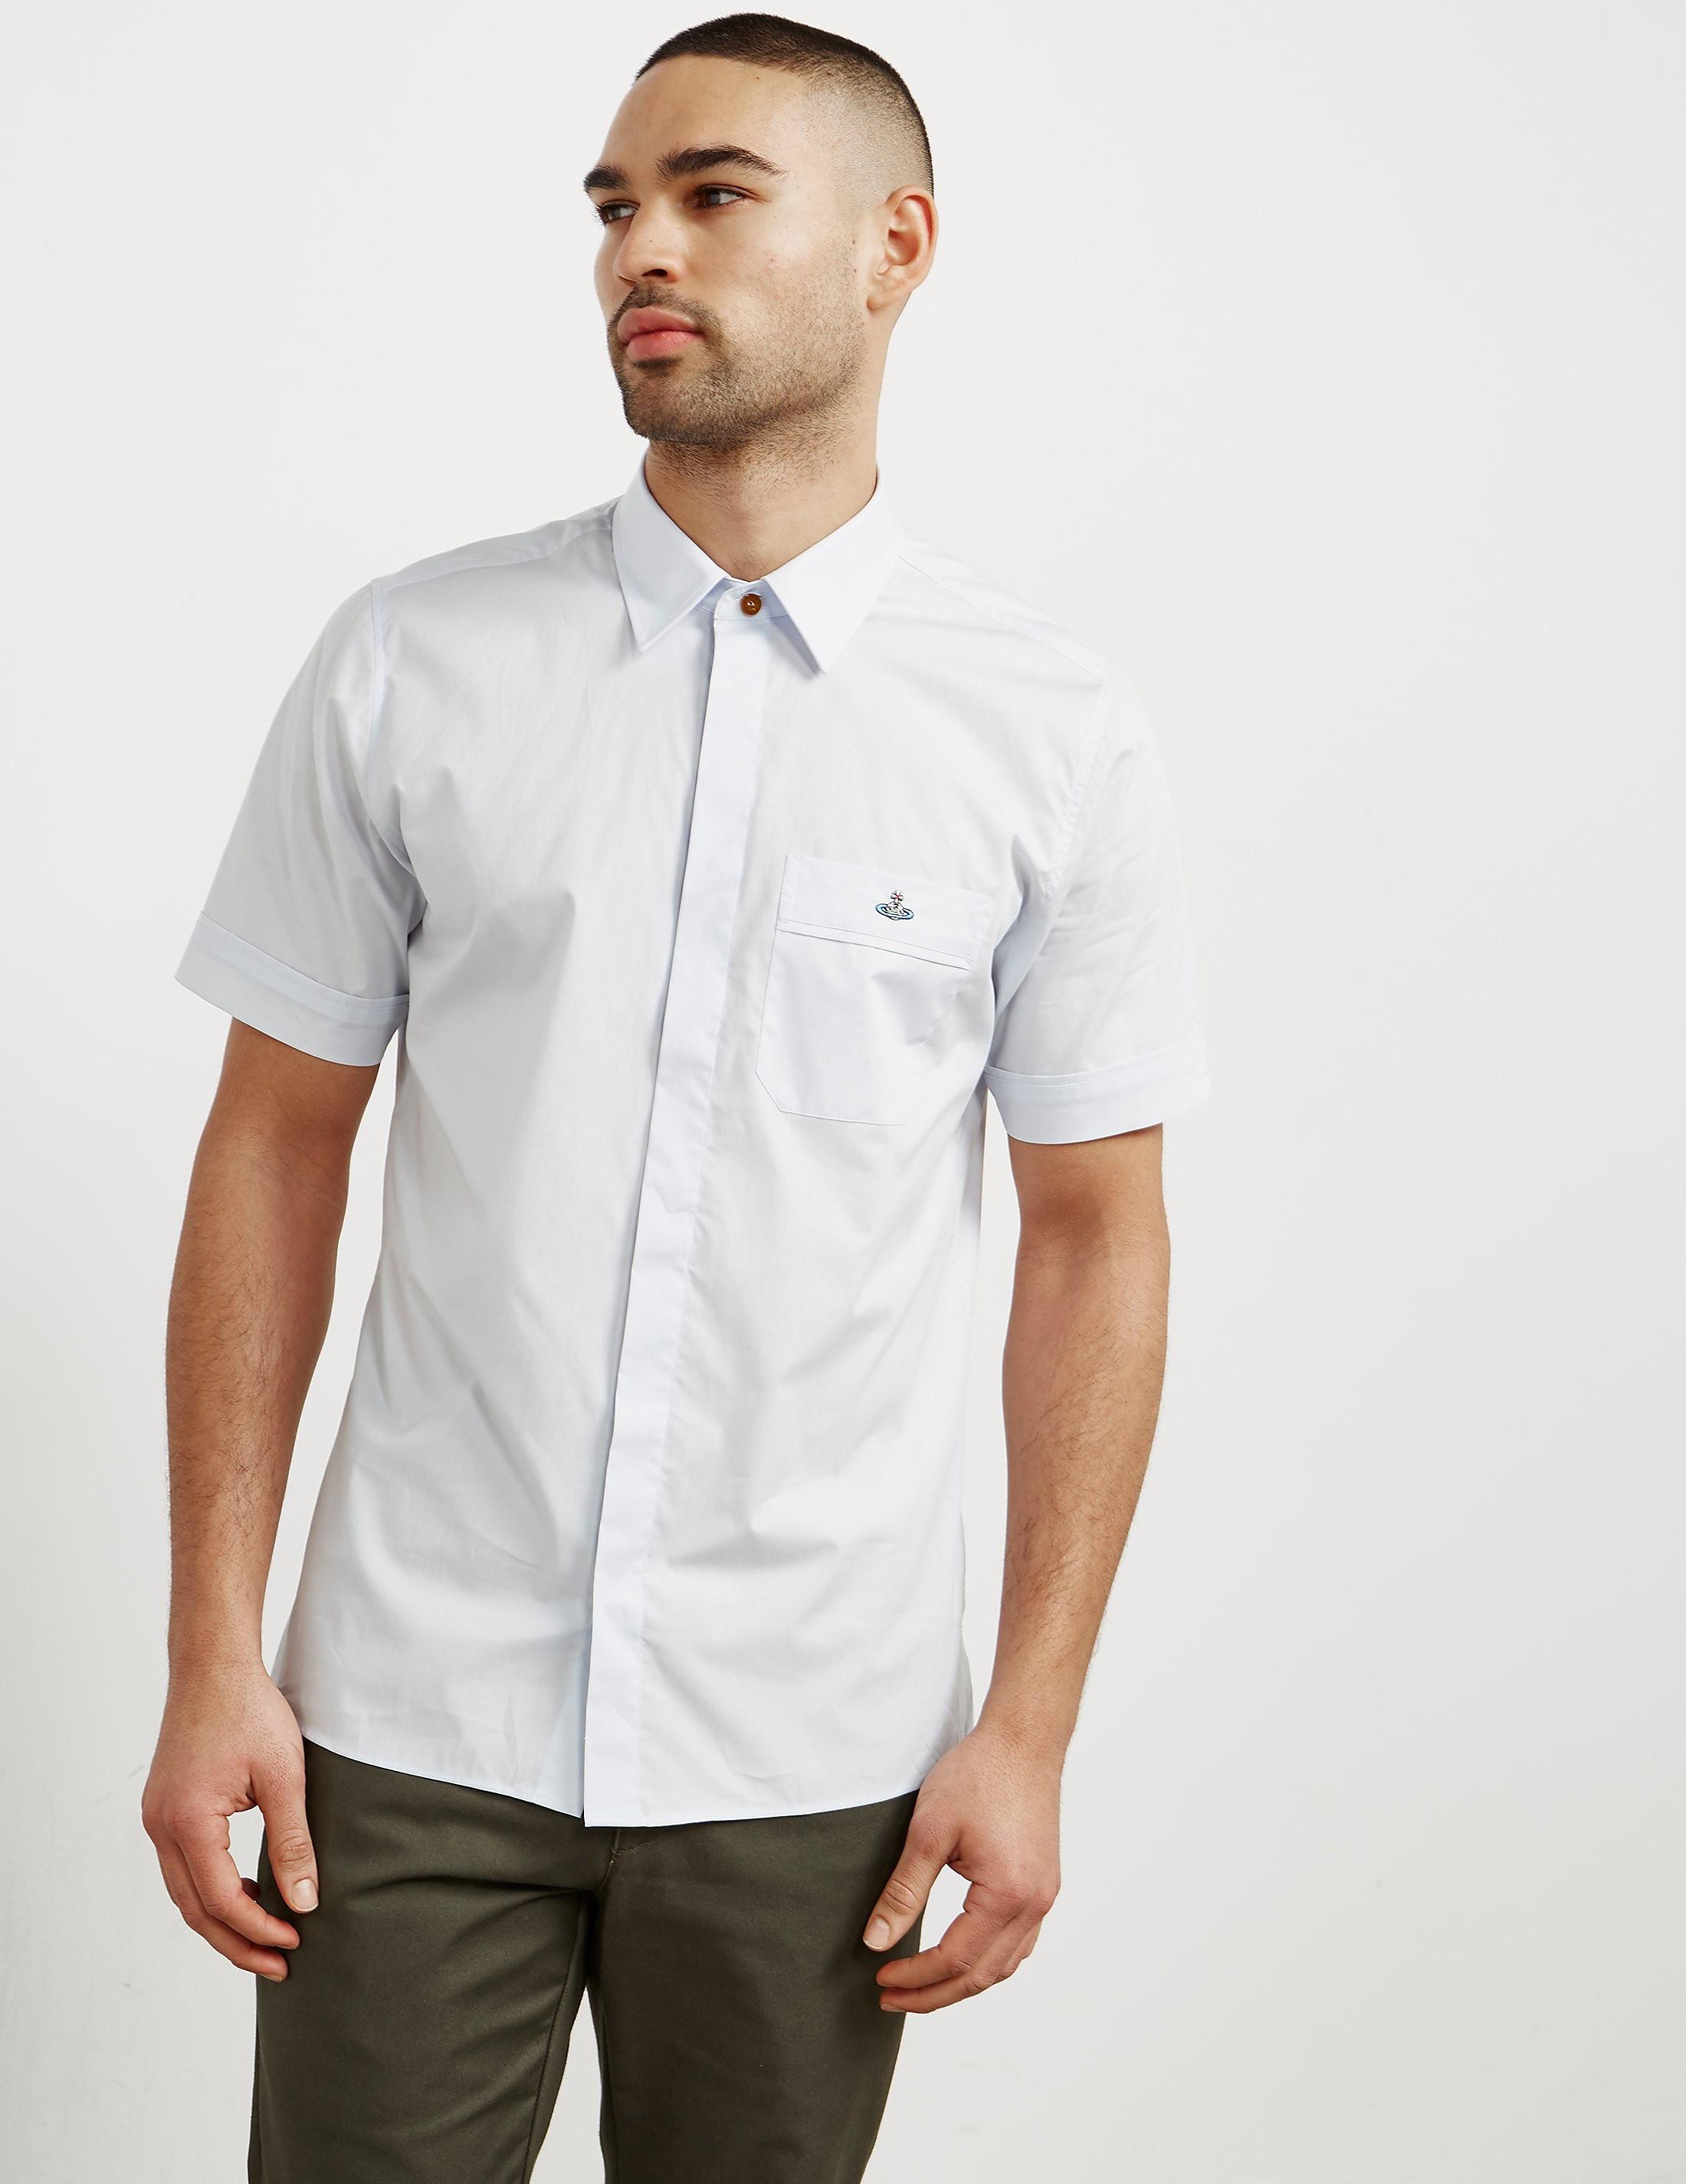 Vivienne Westwood Tonal Orb Short Sleeve Shirt